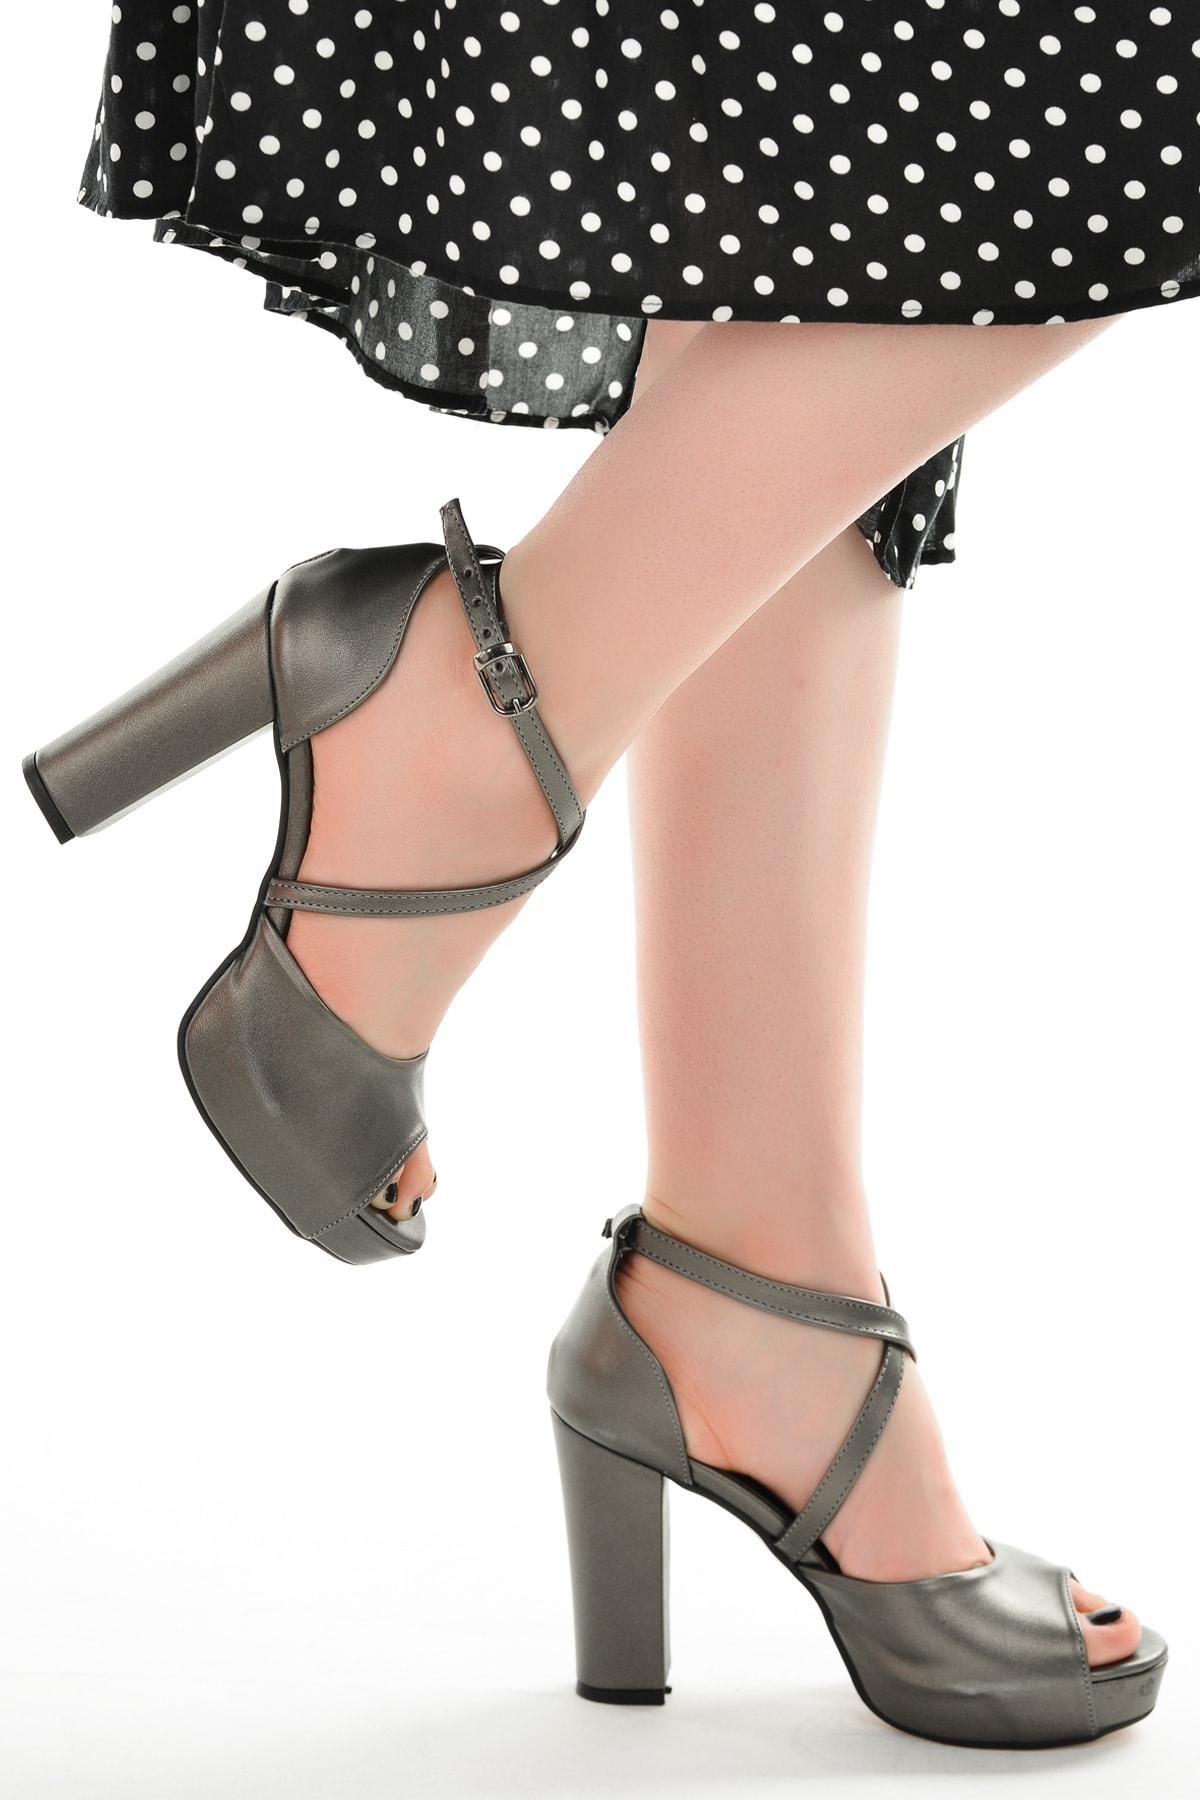 Ayakland Kadın Platin Platform Topuklu Ayakkabı 11 cm 3210-2058 2